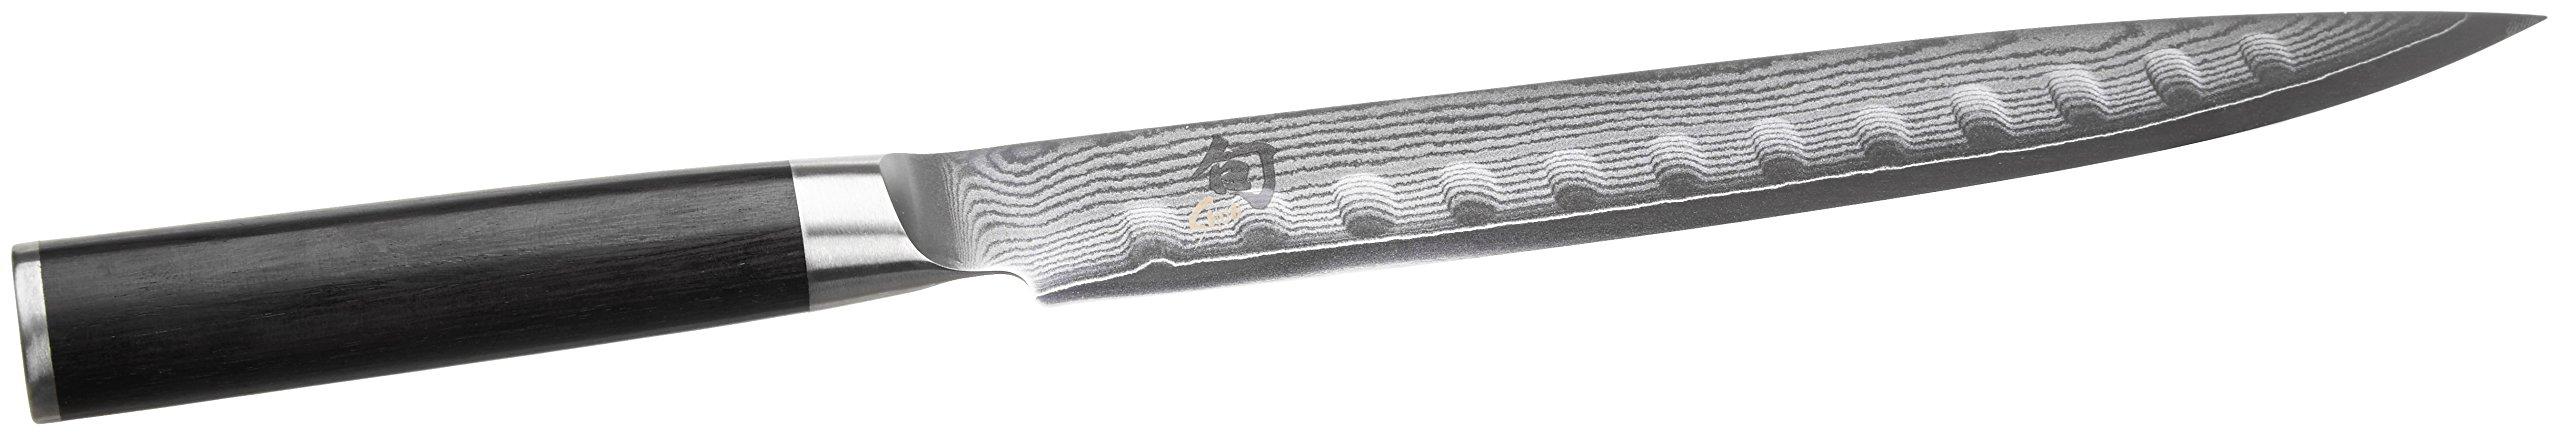 Shun DM0720 Classic Hollow-Ground Slicing Knife, 9-Inch